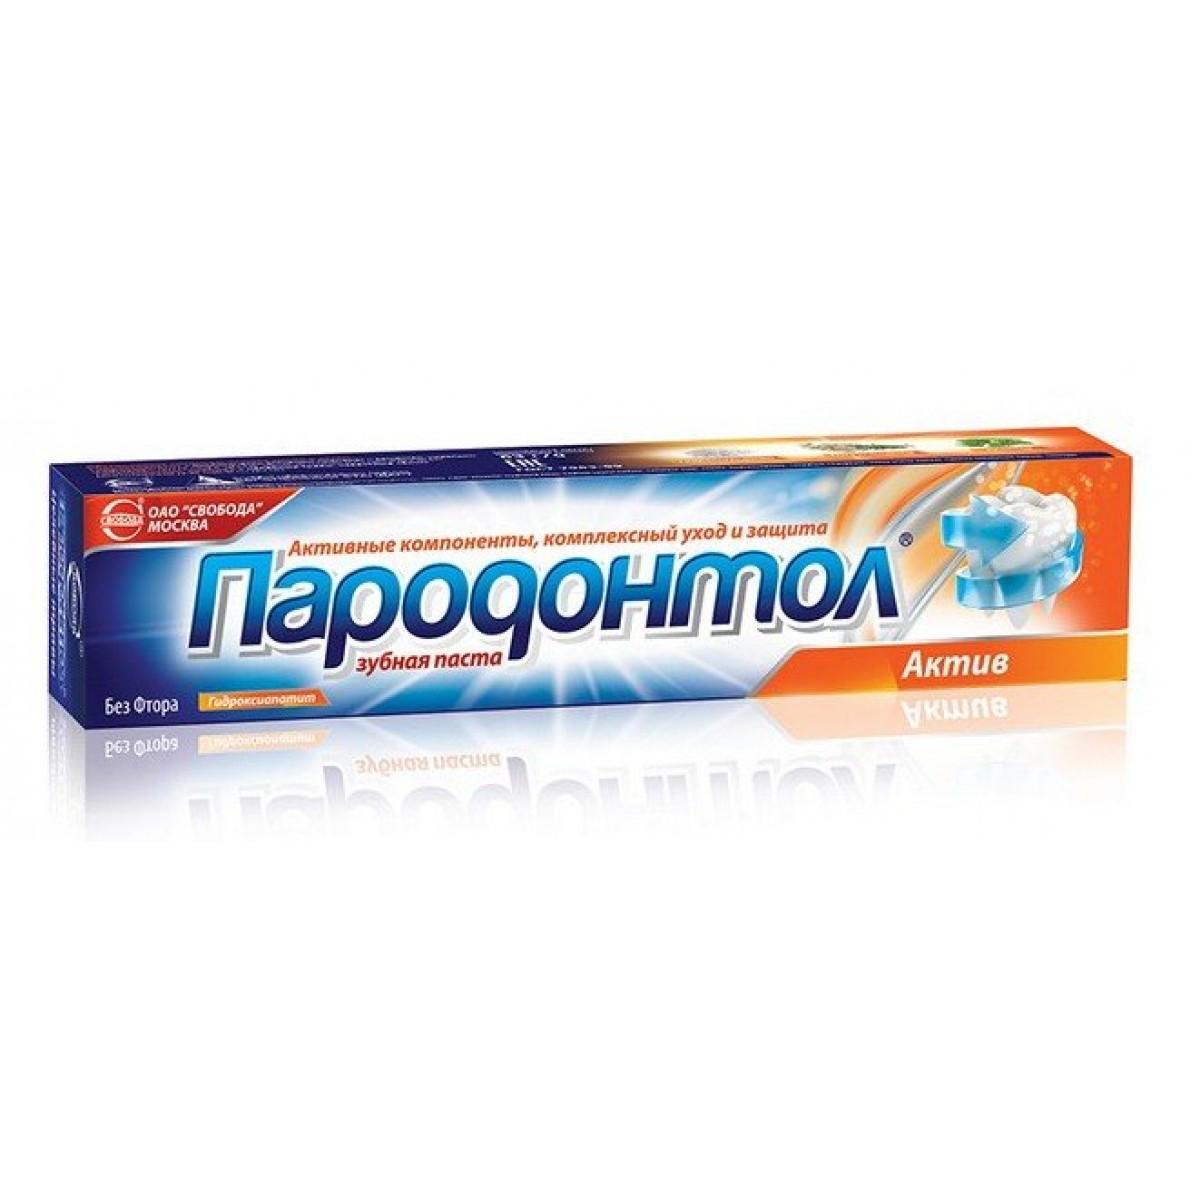 ЗП ПАРОДОНТОЛ АКТИВ 63ГР